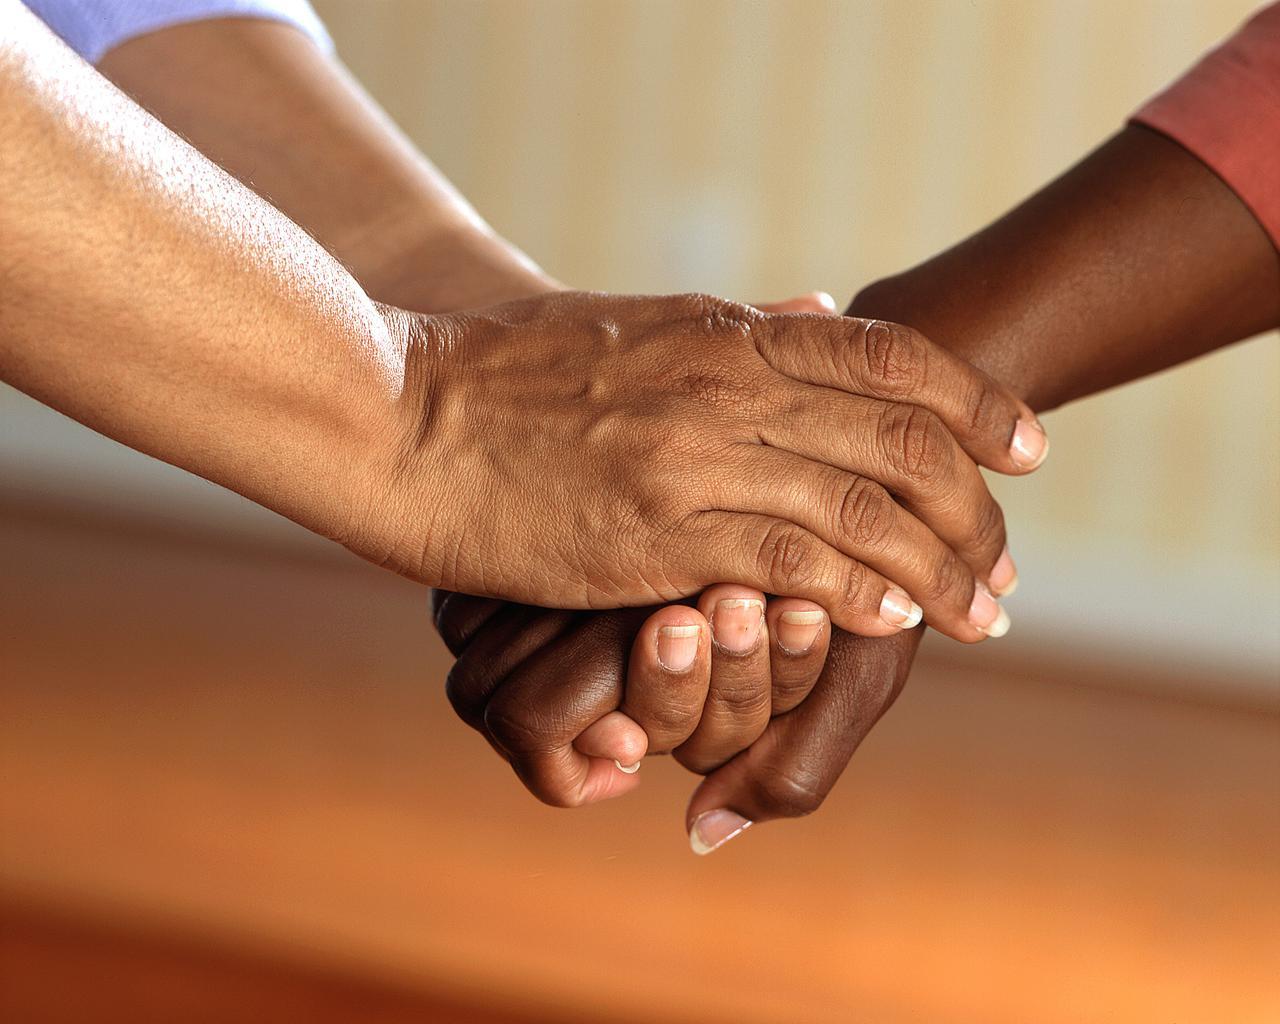 3ff37b78-1404-11e7-9eb8-0242ac110002.clasped-hands-comfort-hands-people-45842.jpeg